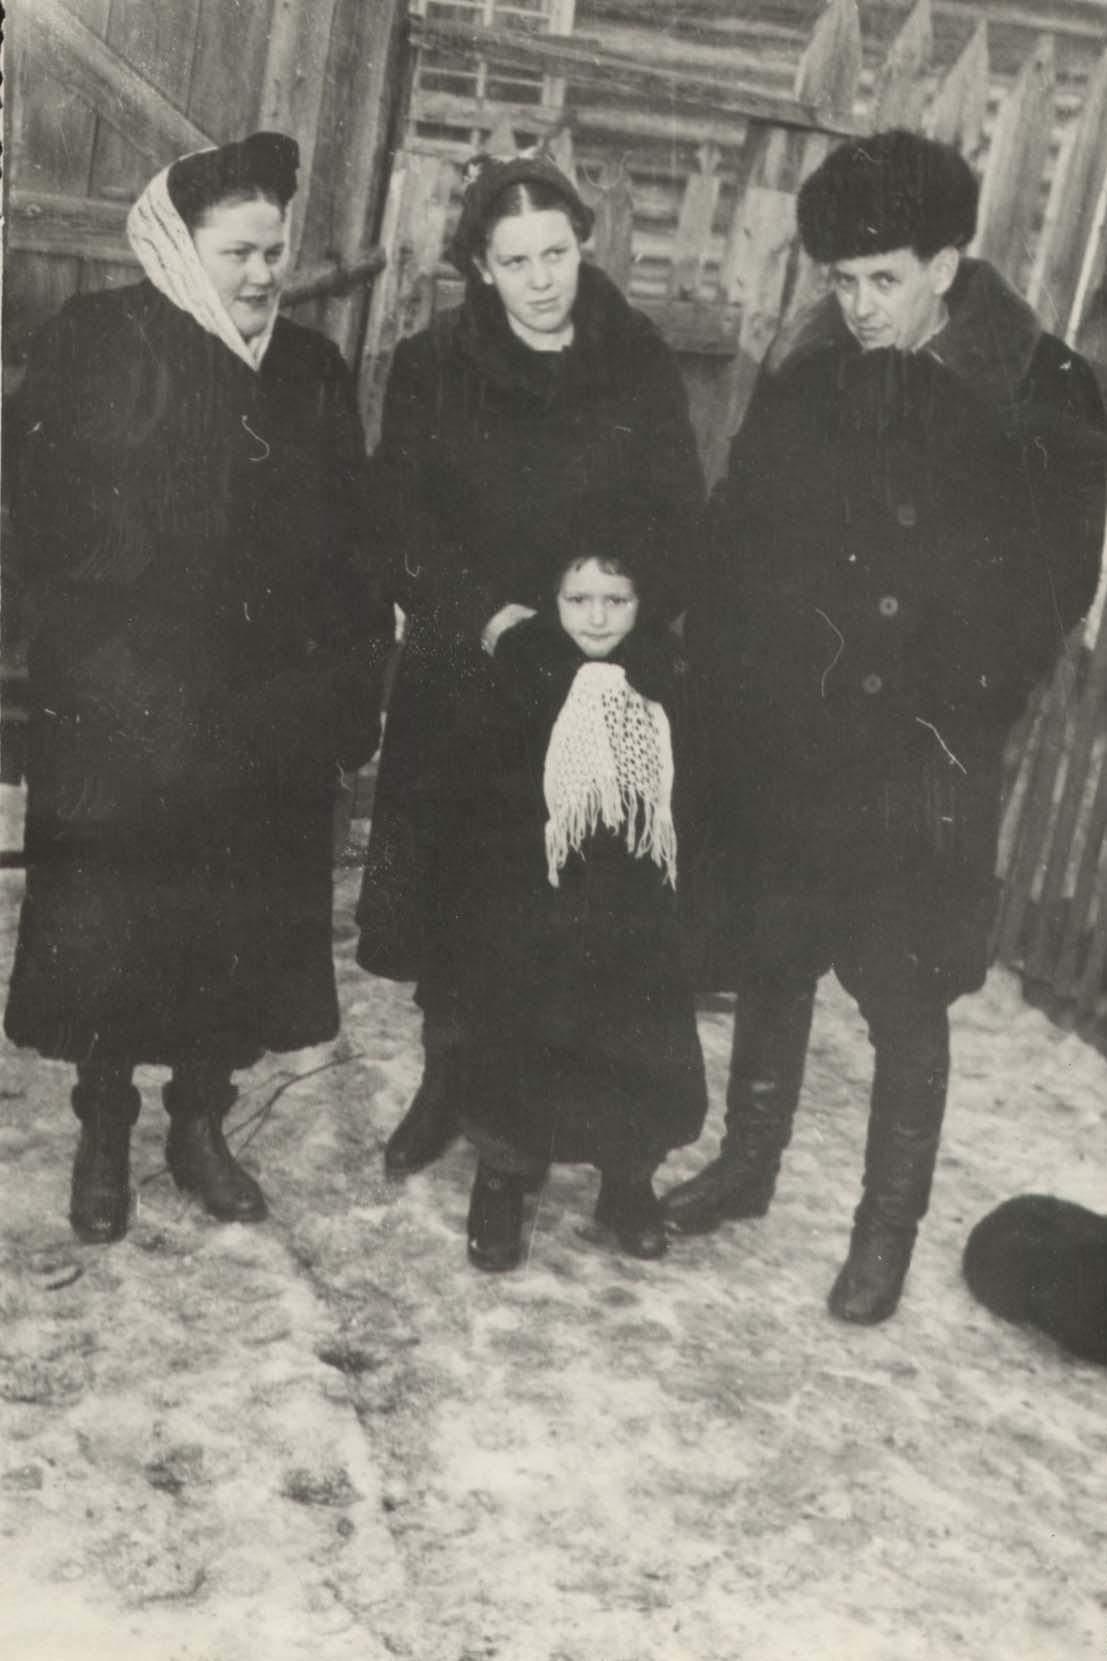 Слева направо: Израилева (Филиппова) Тамара Григорьевна, Блохина (Маценок) Маргарита, ? (Израилева) Тамара, Израилев — муж Тамары. Фото сделано в 1956 г. в. г. Бодайбо